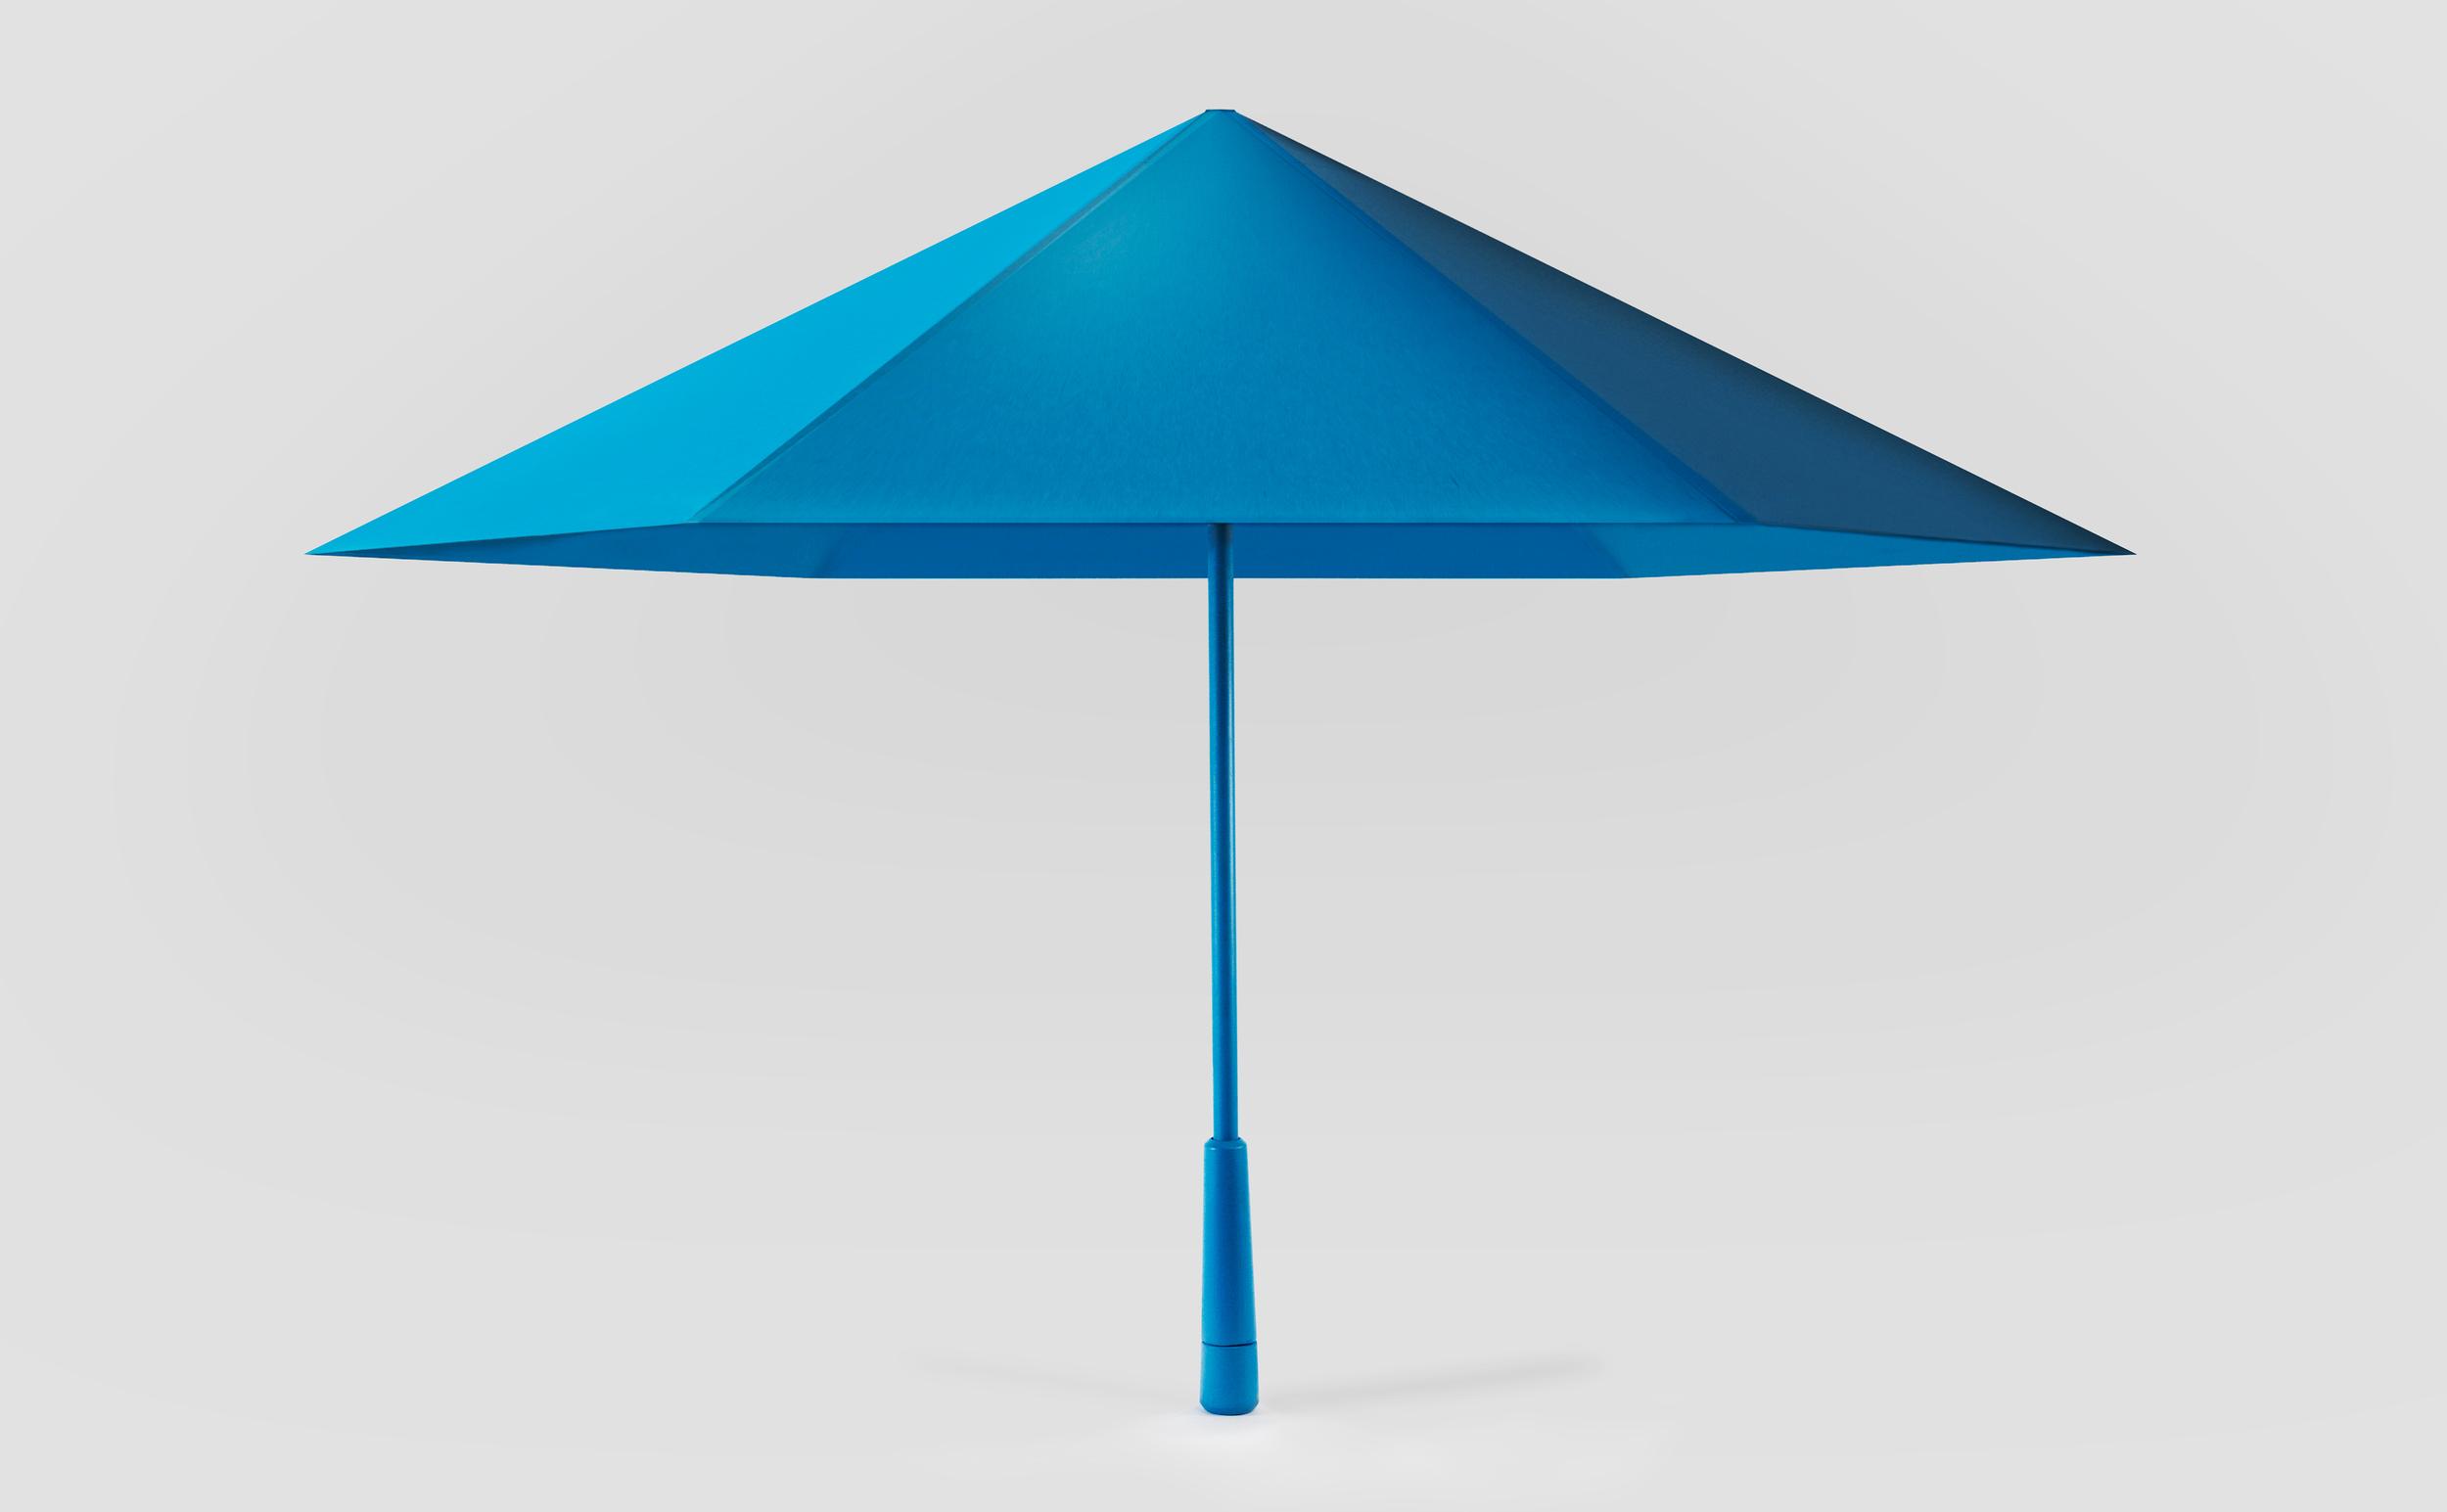 Sa Umbrella - Coolneeded